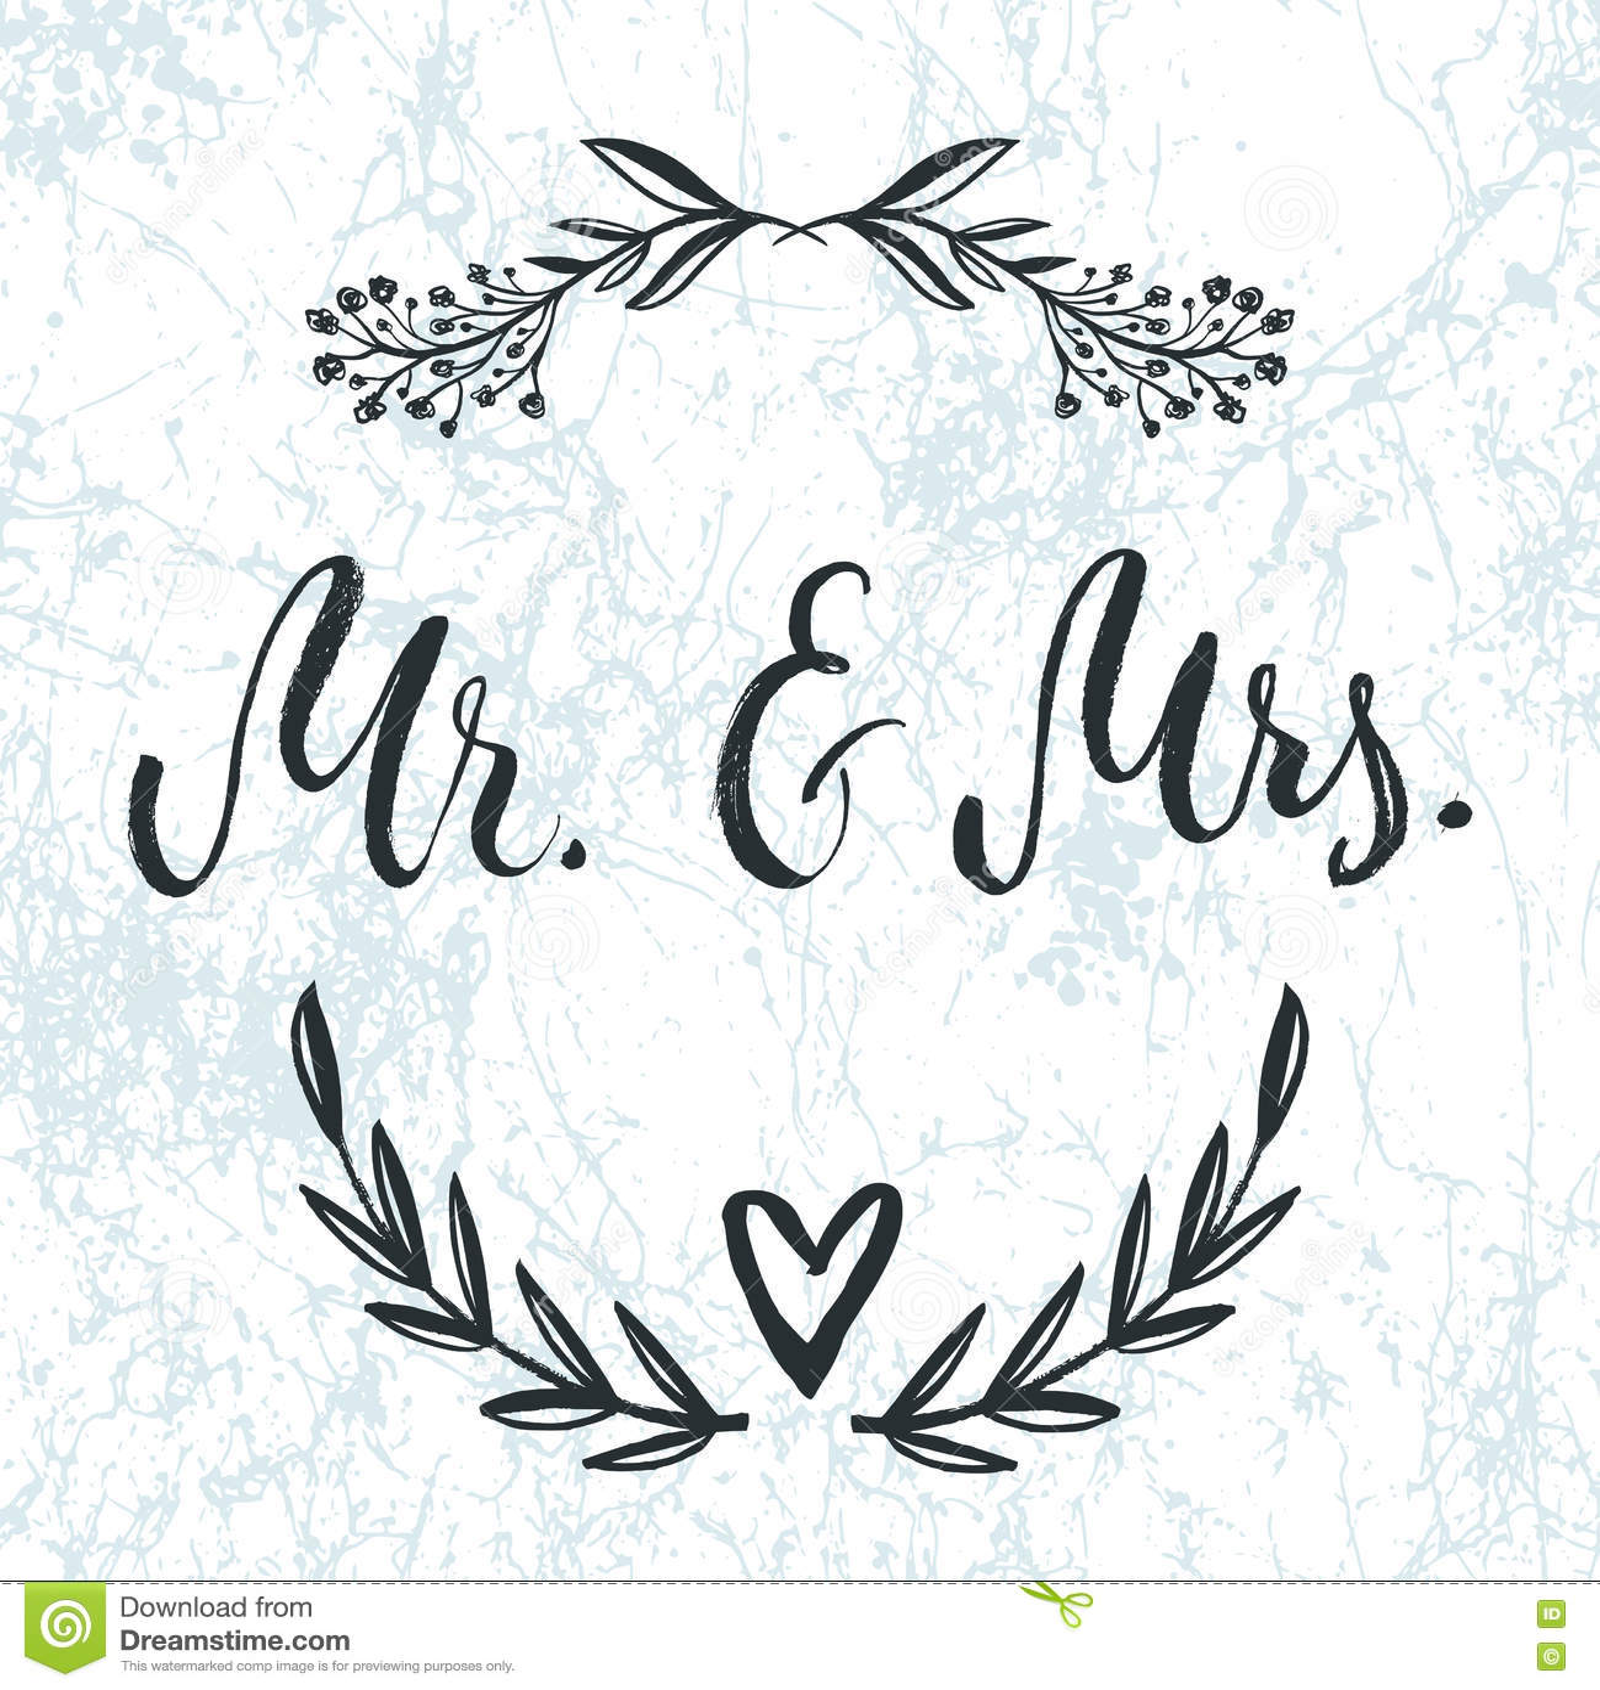 Mr mrs and ampersand symbol bride groom wedding